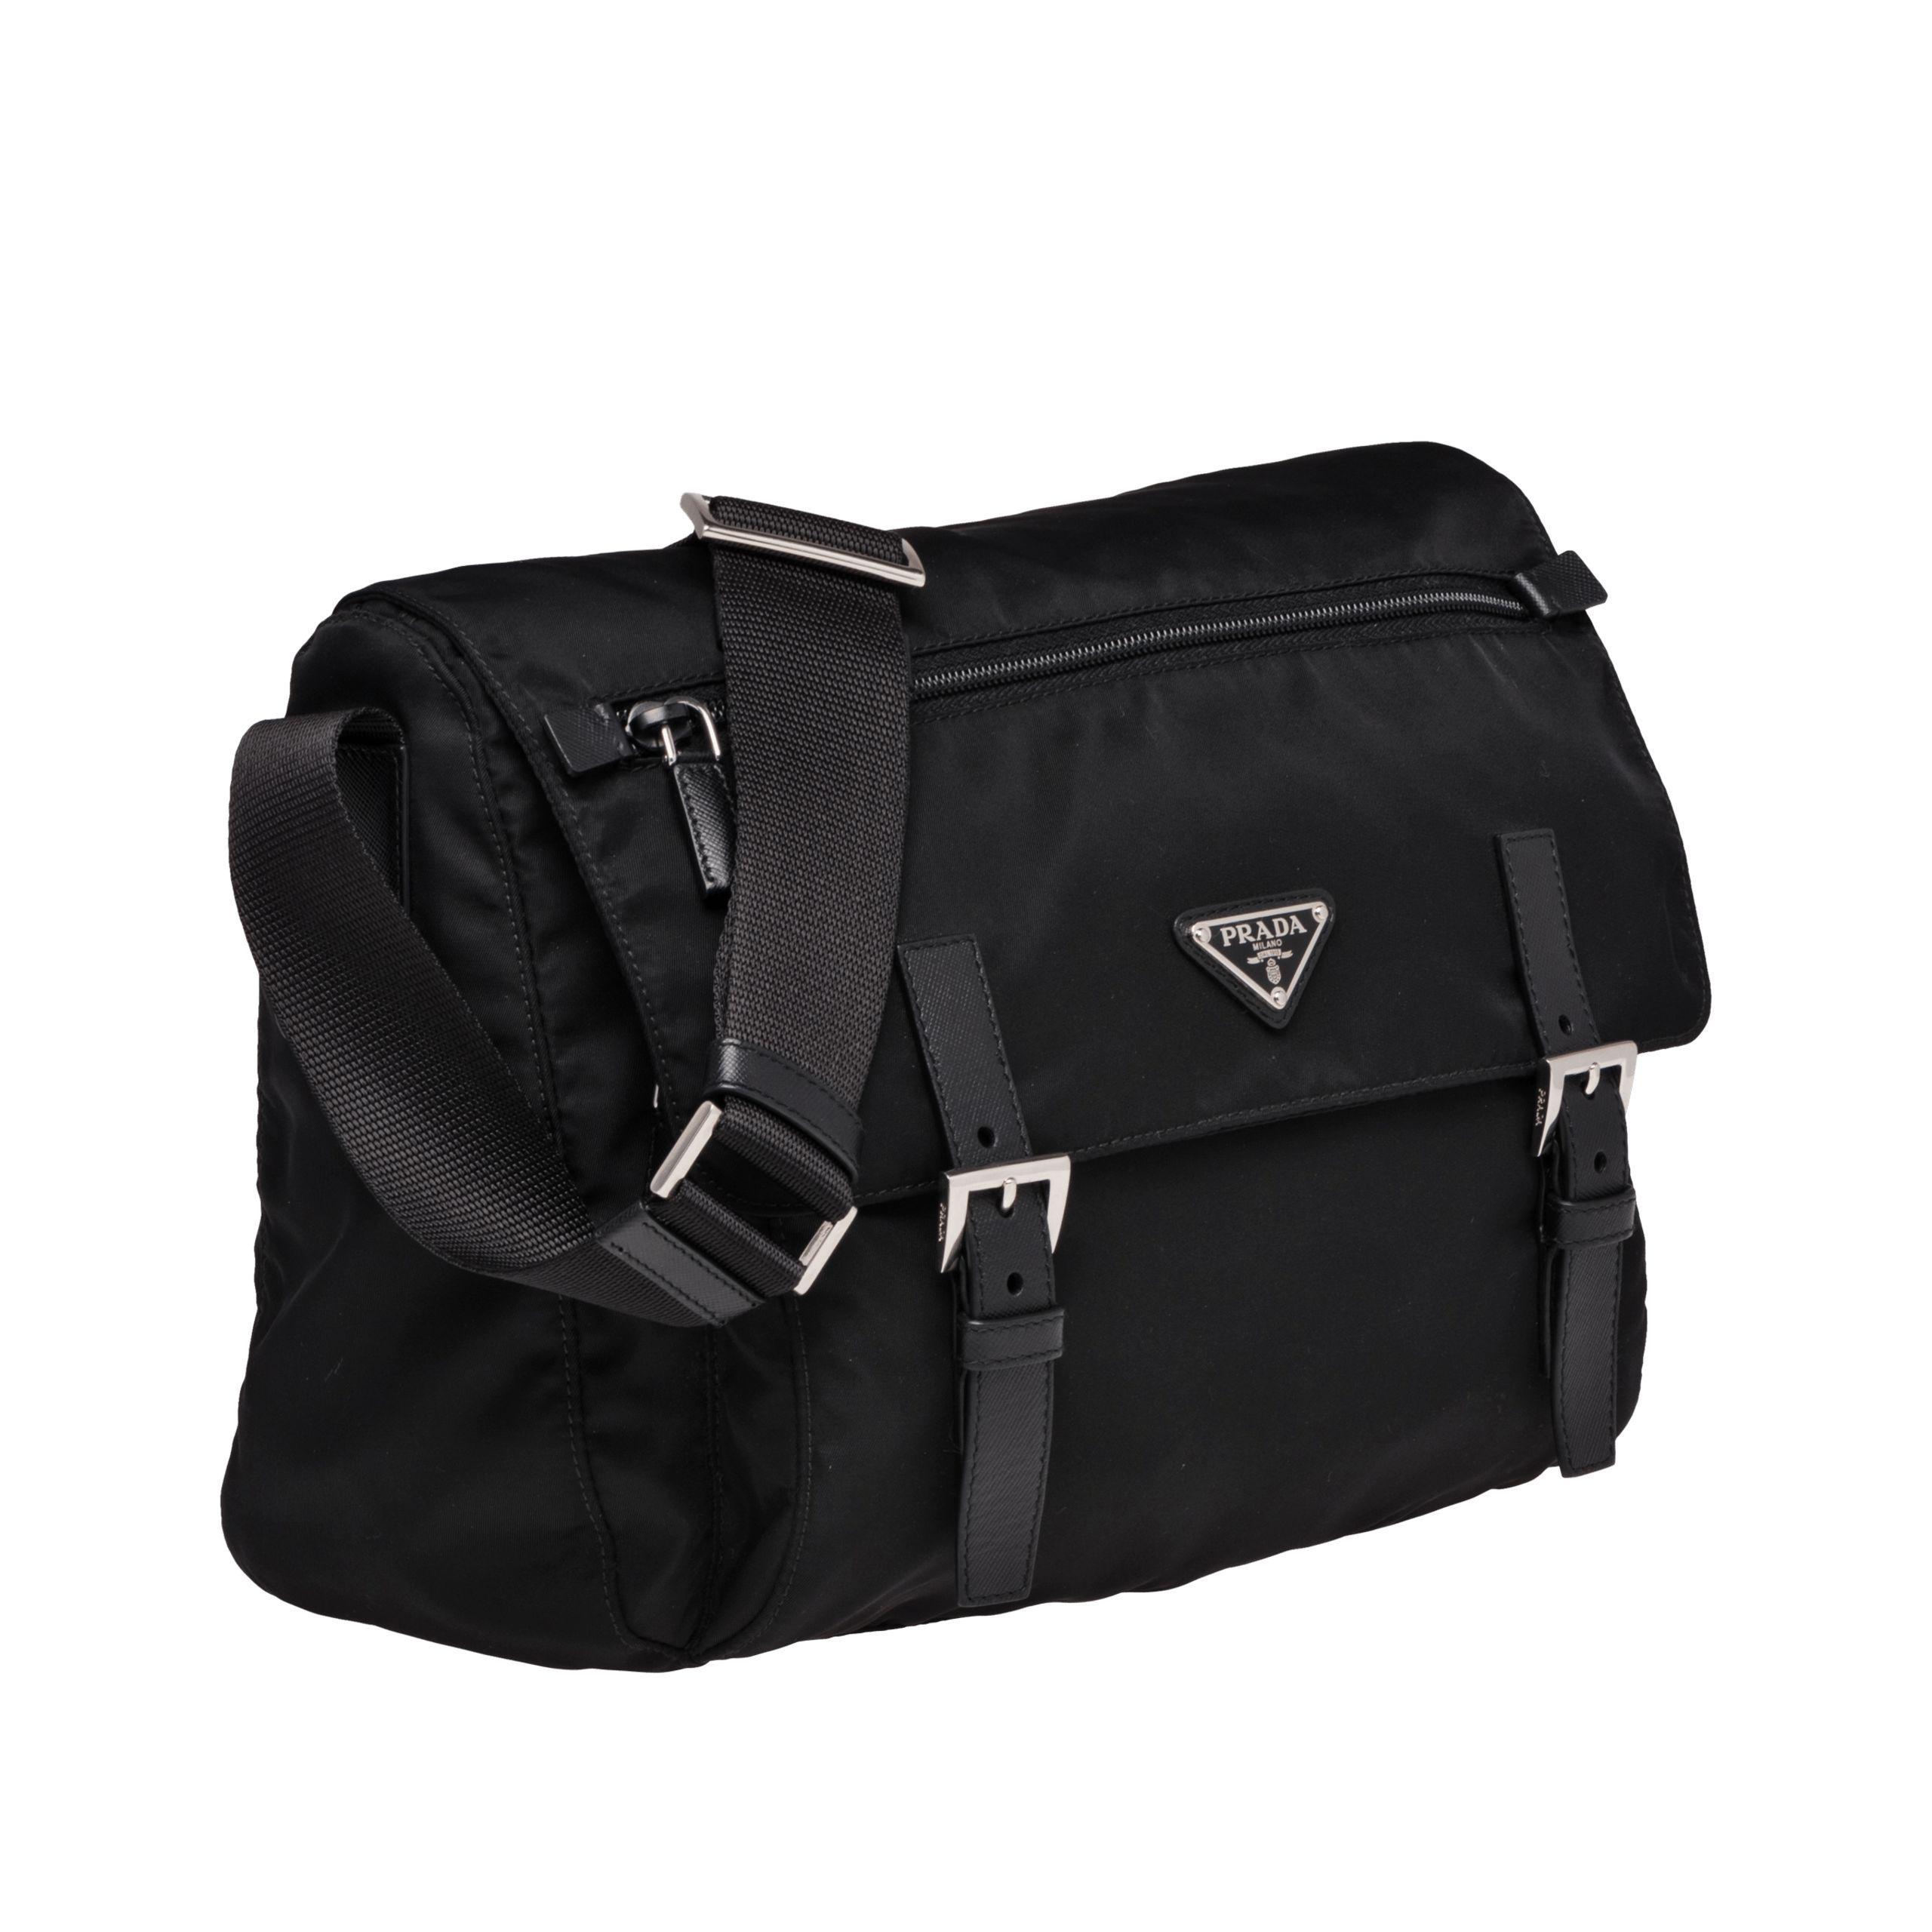 013cfbad85 ... nylon double compartment crossbody bag black nero 0d220 05d3d cheap  prada black fabric bag lyst. view fullscreen eb24c 4384d ...